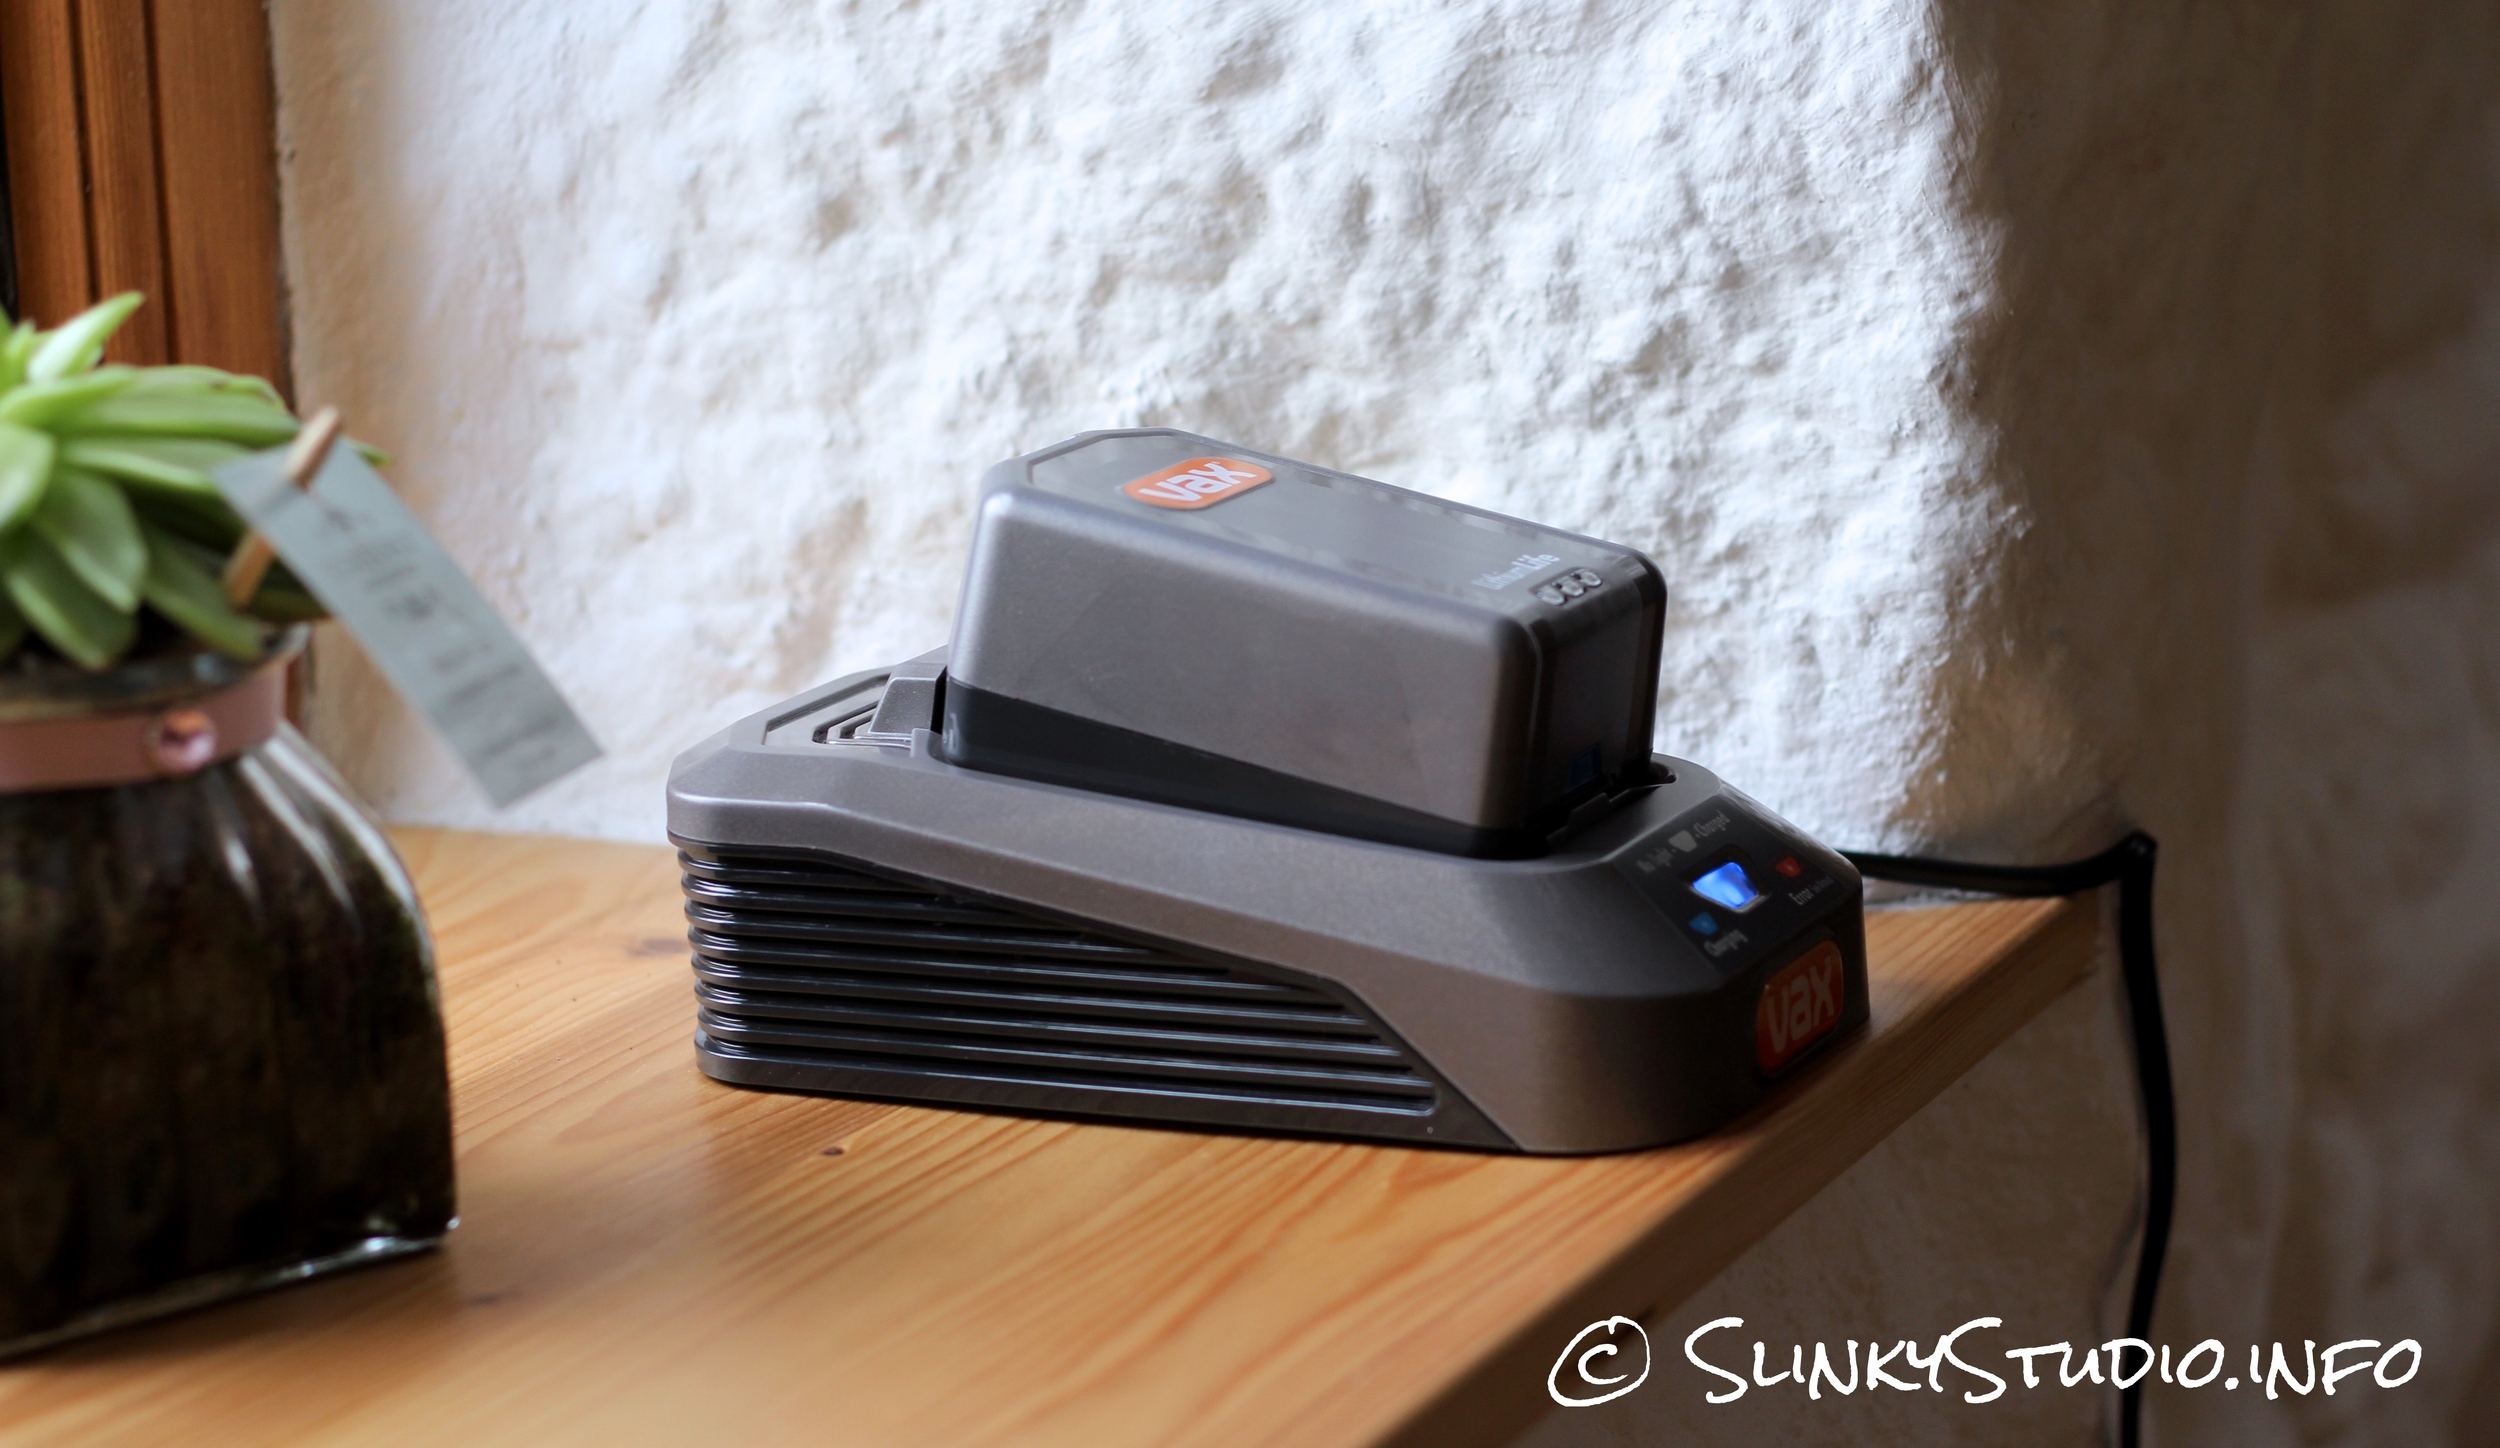 Vax Air Cordless Lift Battery Charger.jpg